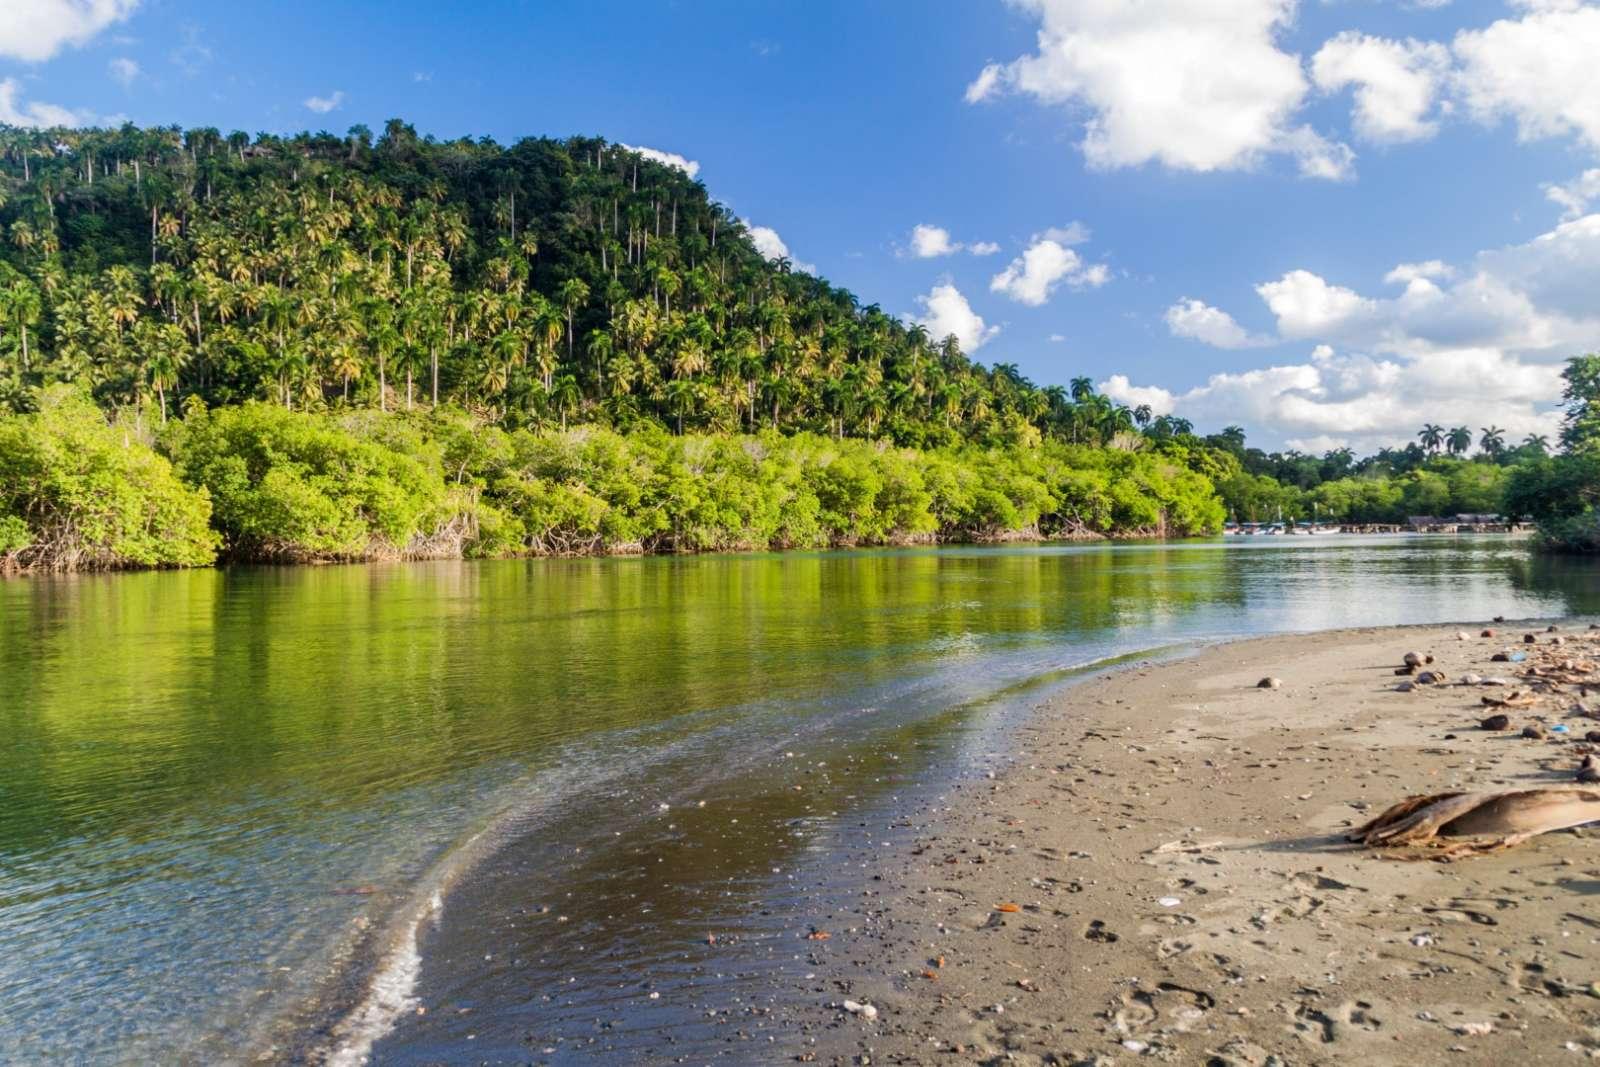 Mouth of the Rio Miel near Baracoa Cuba